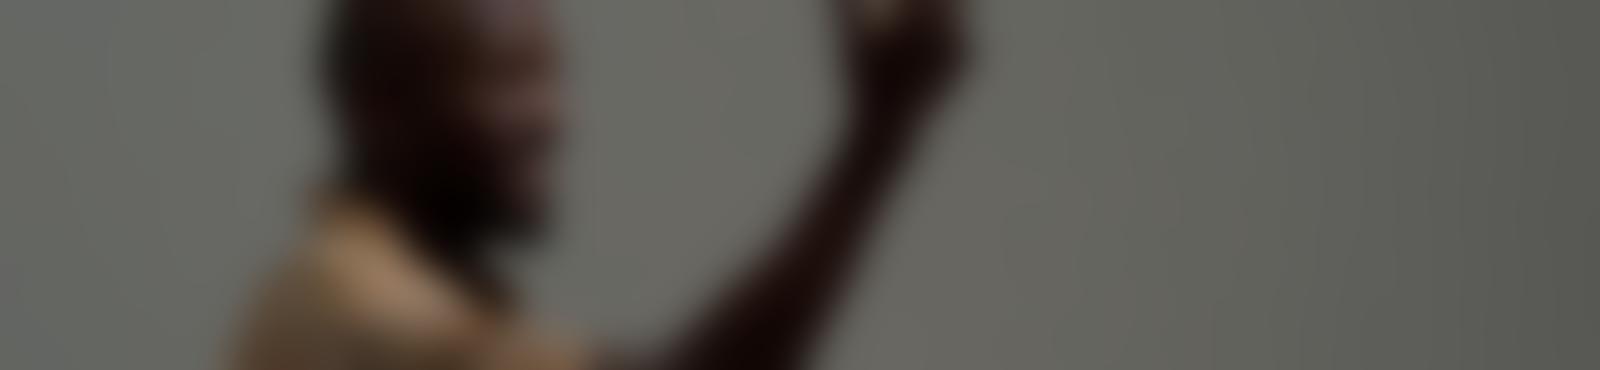 Blurred 48ee1471 b521 4d06 bf15 8dd5c9f86f7c